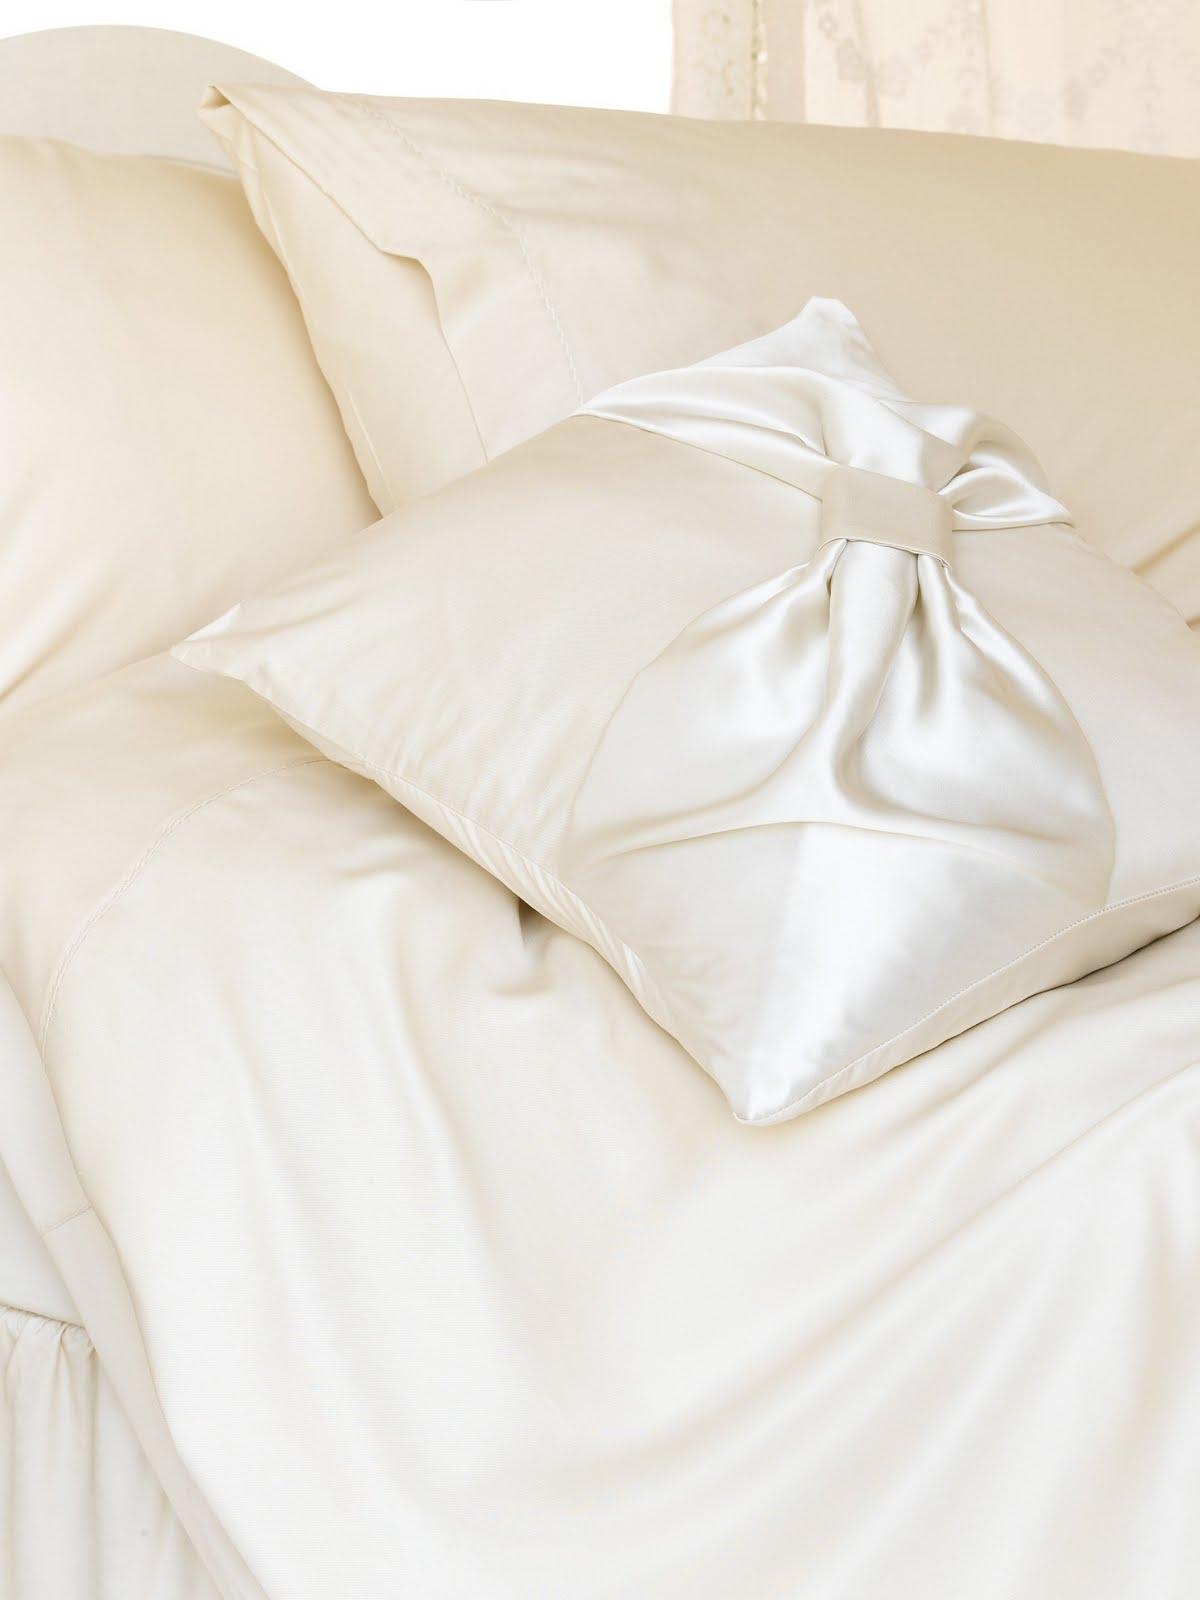 http://4.bp.blogspot.com/-hUl91evRRKw/TkPFT1SNExI/AAAAAAAAIIw/CRVF36L7tgM/s1600/Bamboo-bed-sheets-almond2.jpg